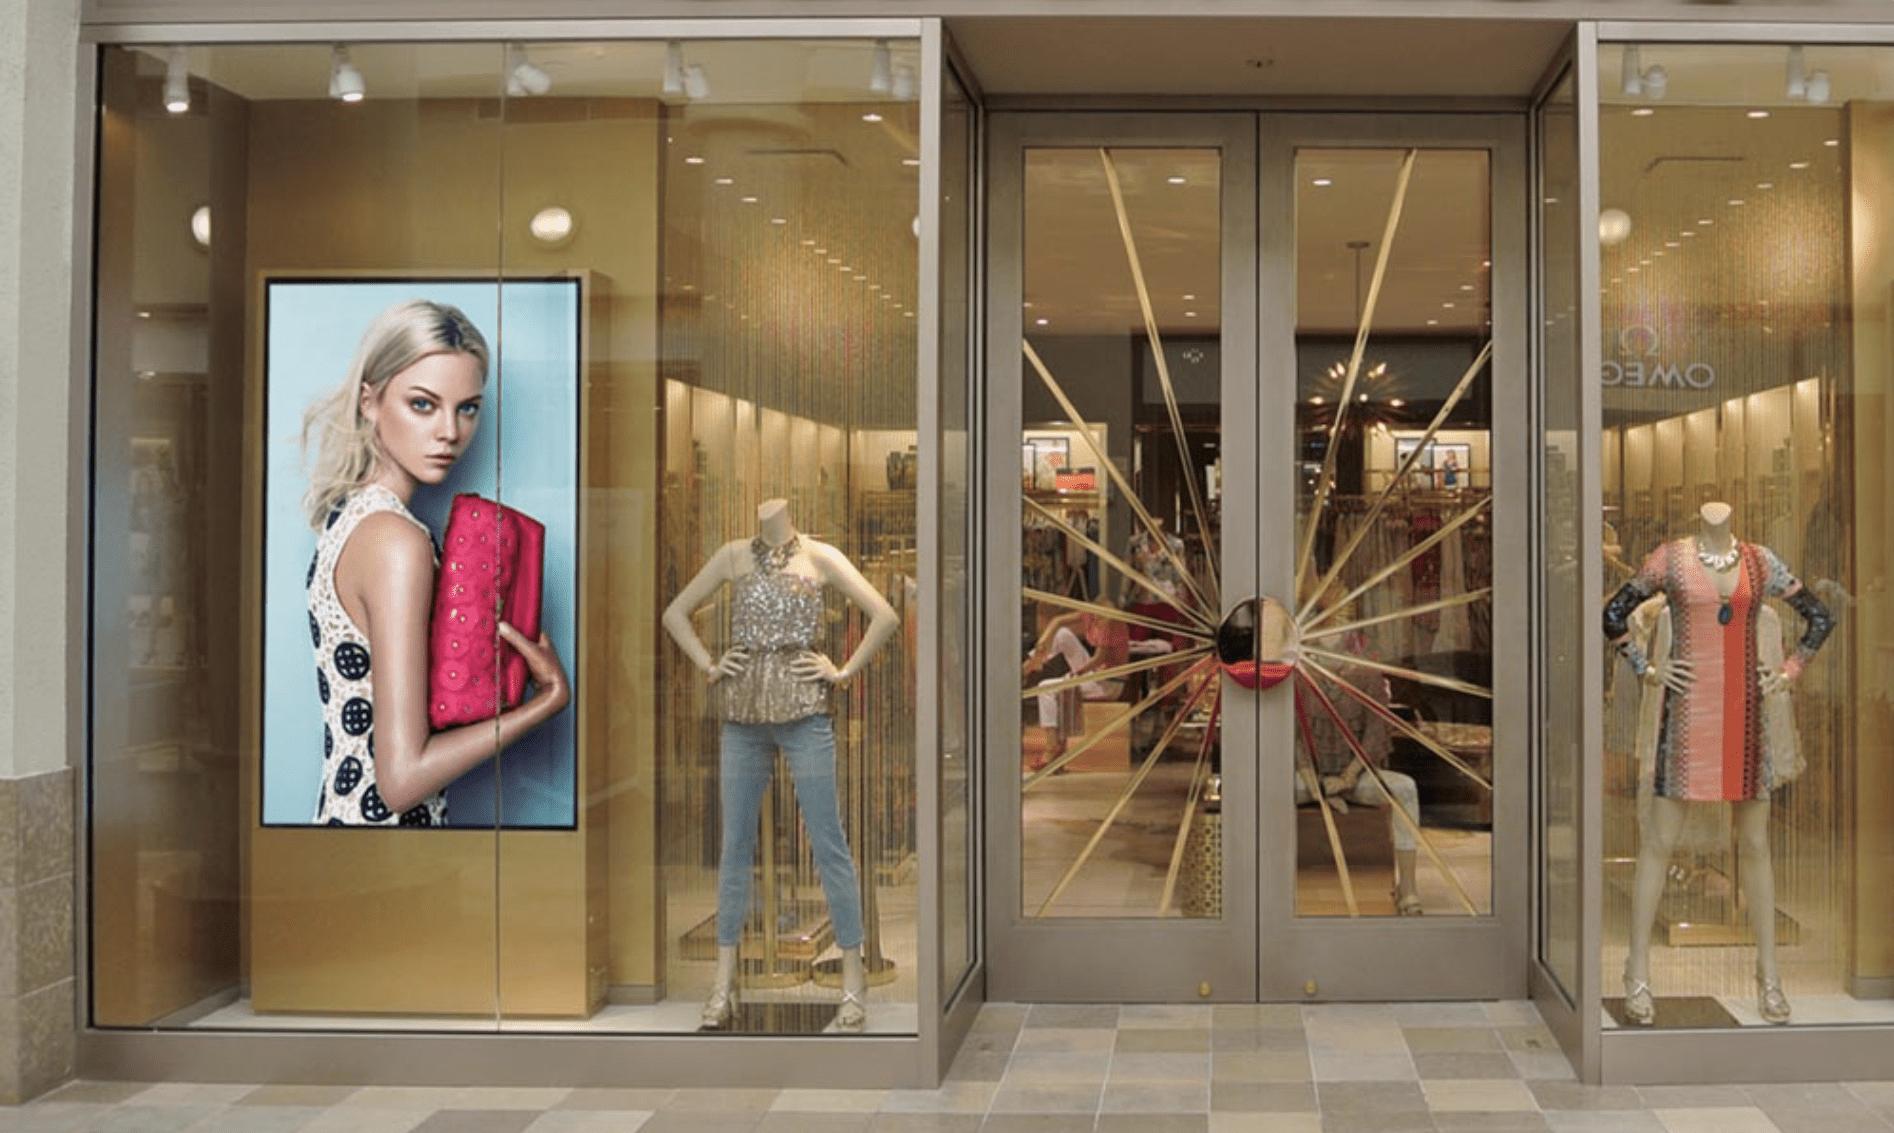 Digital Signage display in the shop window